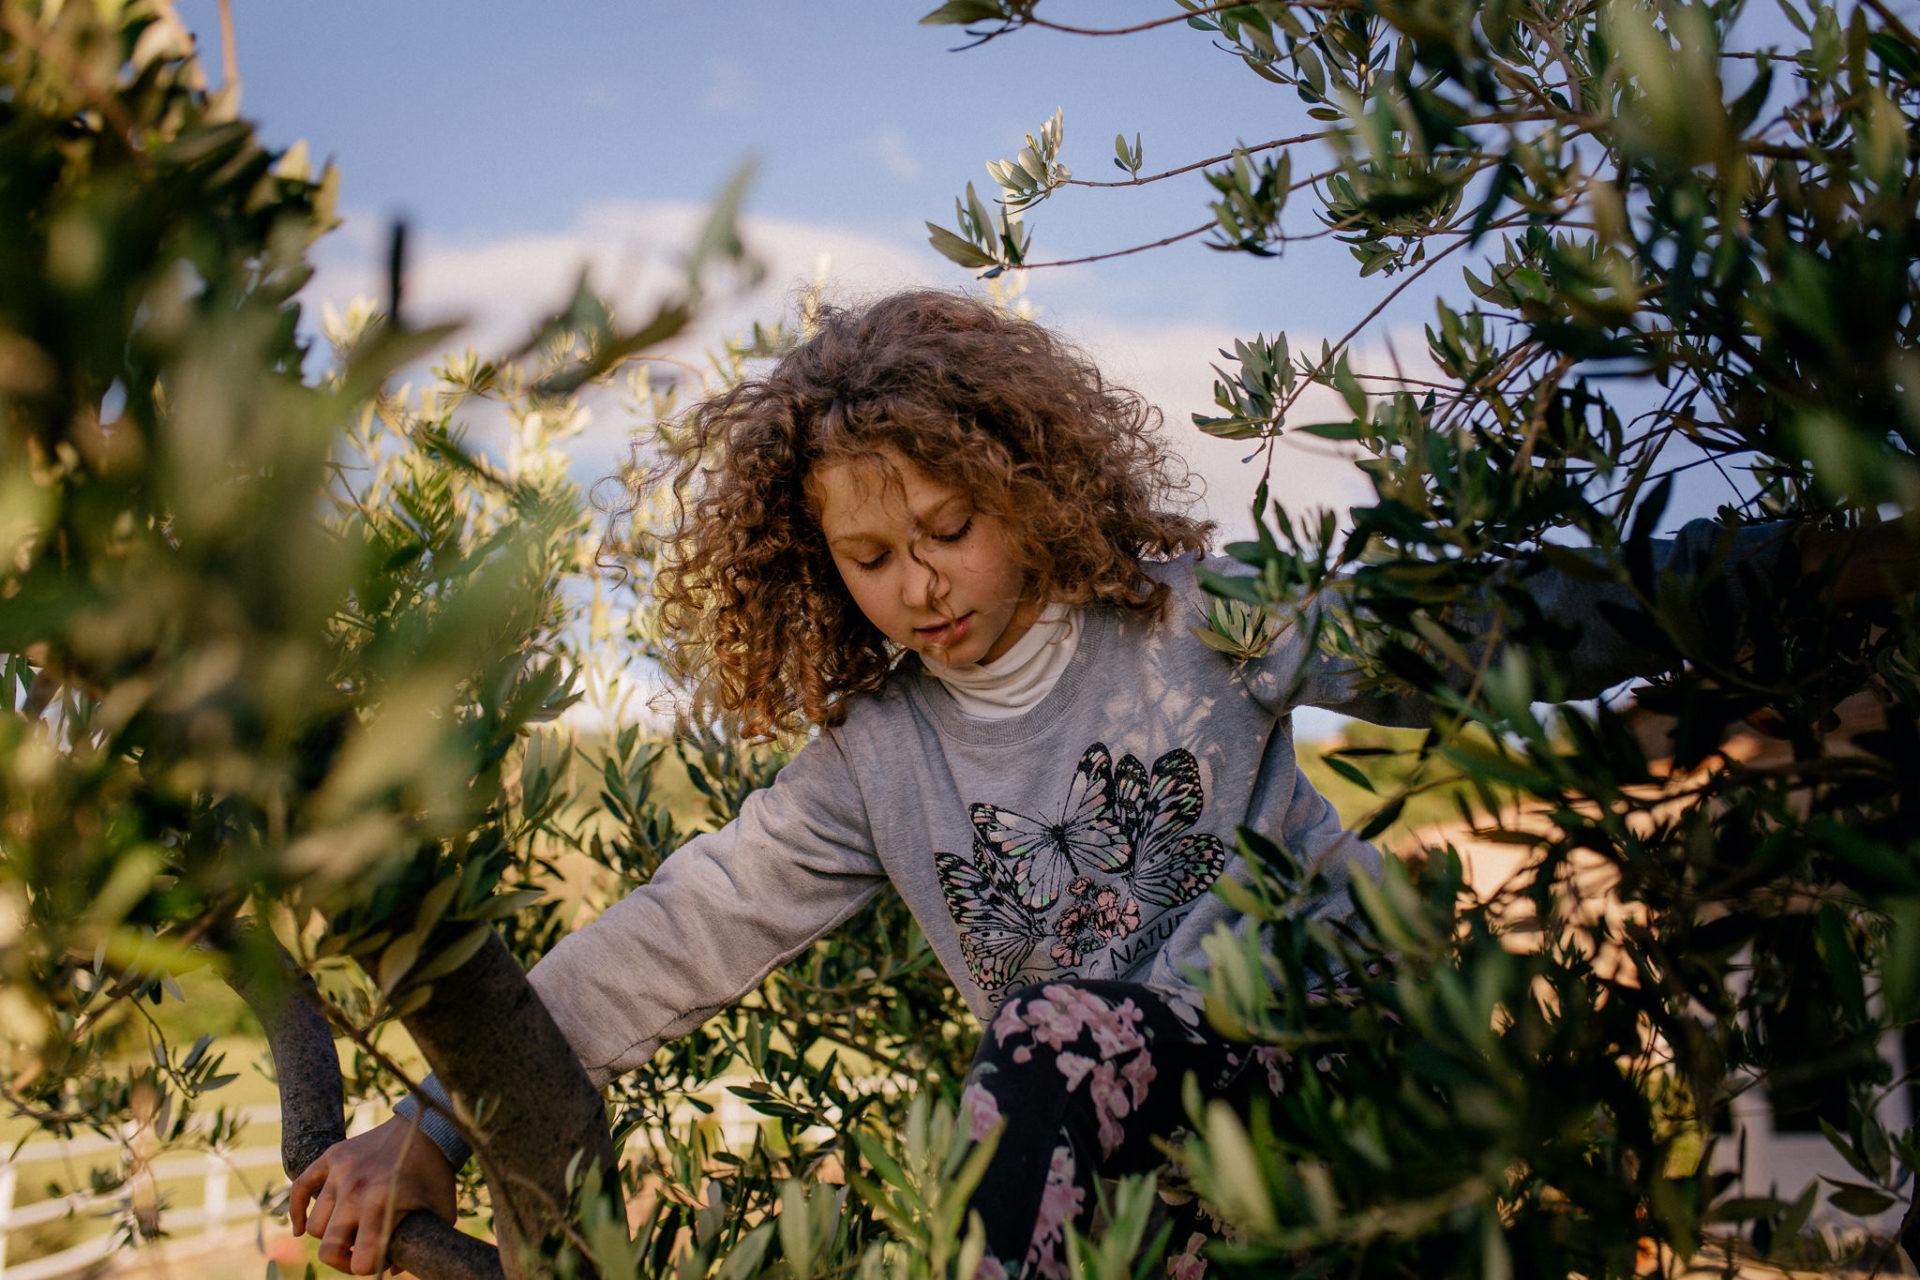 family photos holiday tuscany-girls portrait-dimora santa margherita-travel italy-family photographer stuttgart